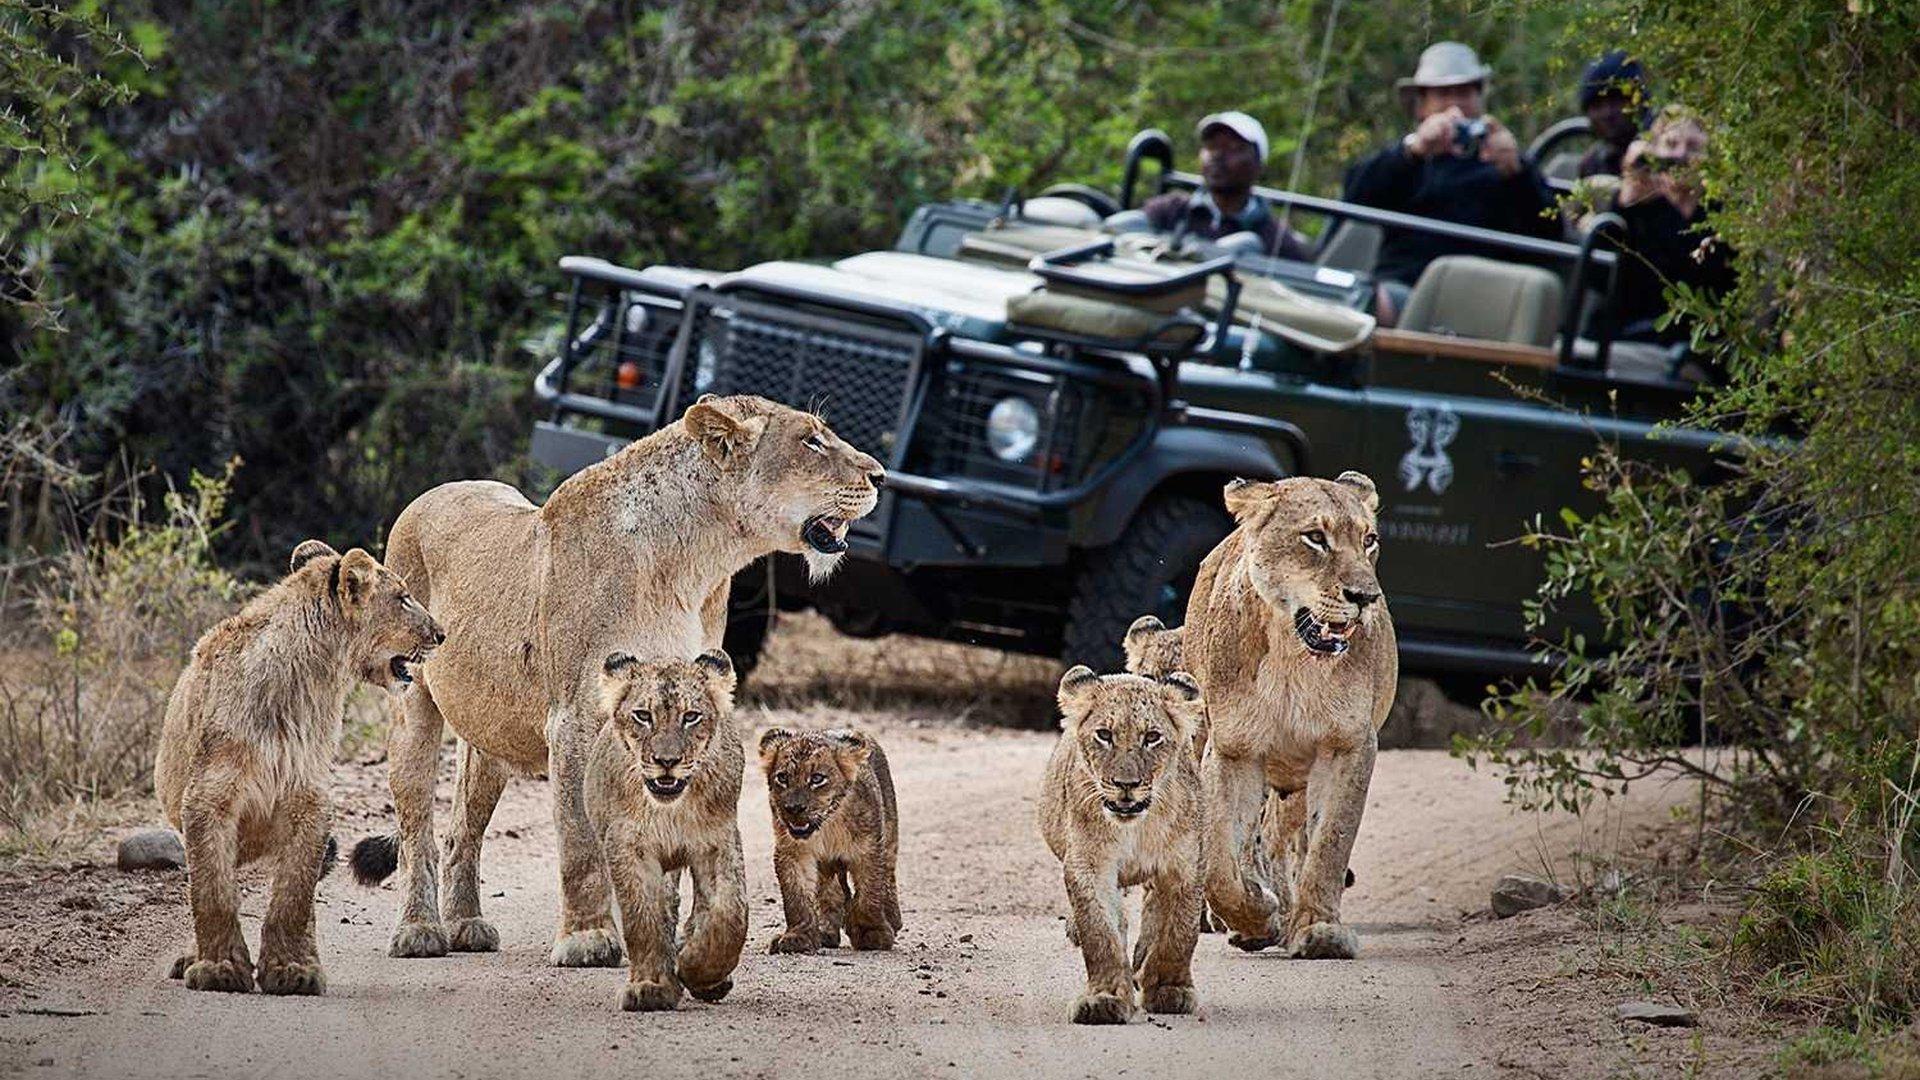 safari song download english